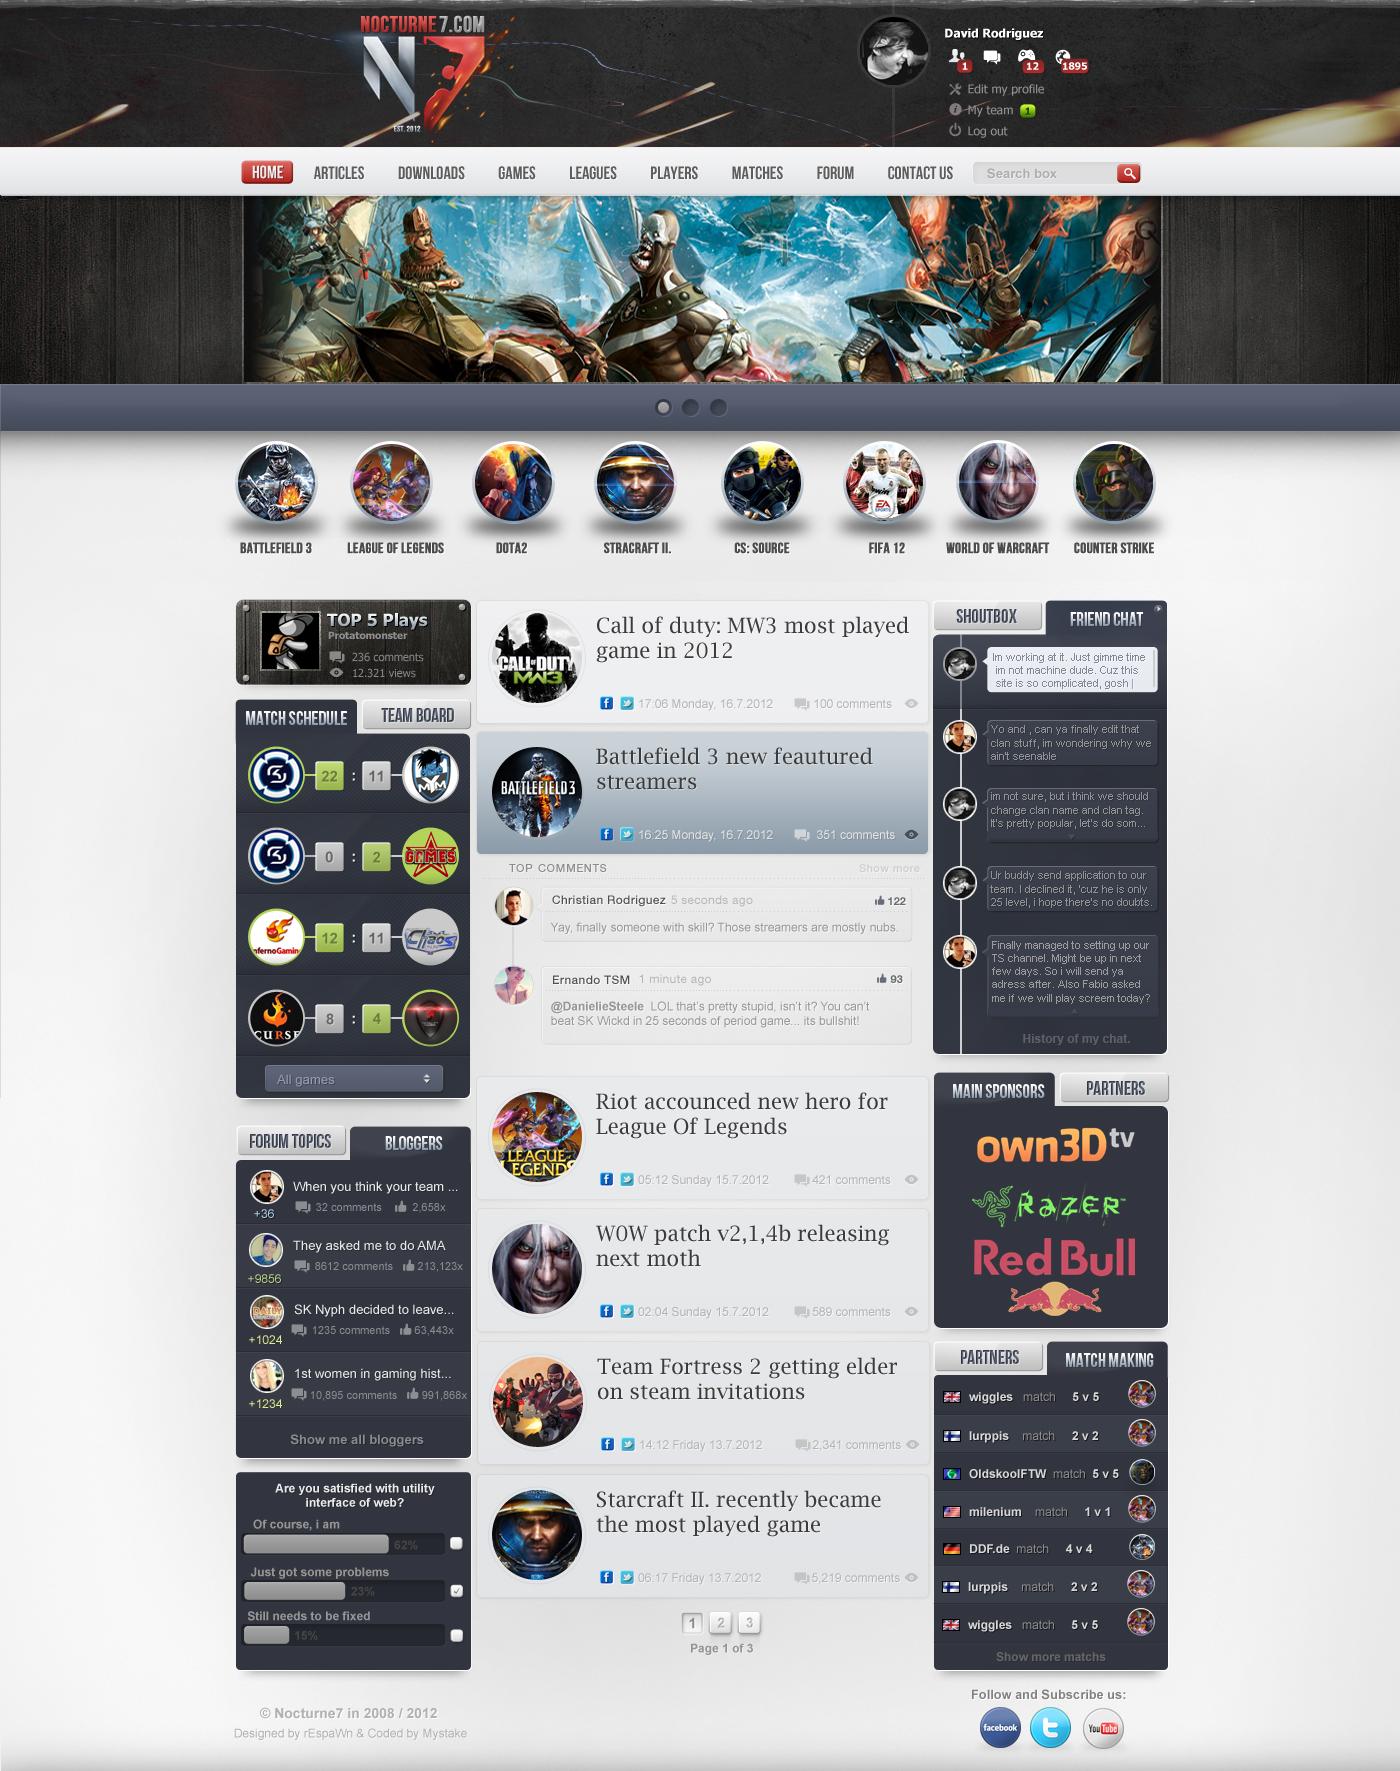 Gaming Nocturne7 webdesign by rEspaWn16 on DeviantArt